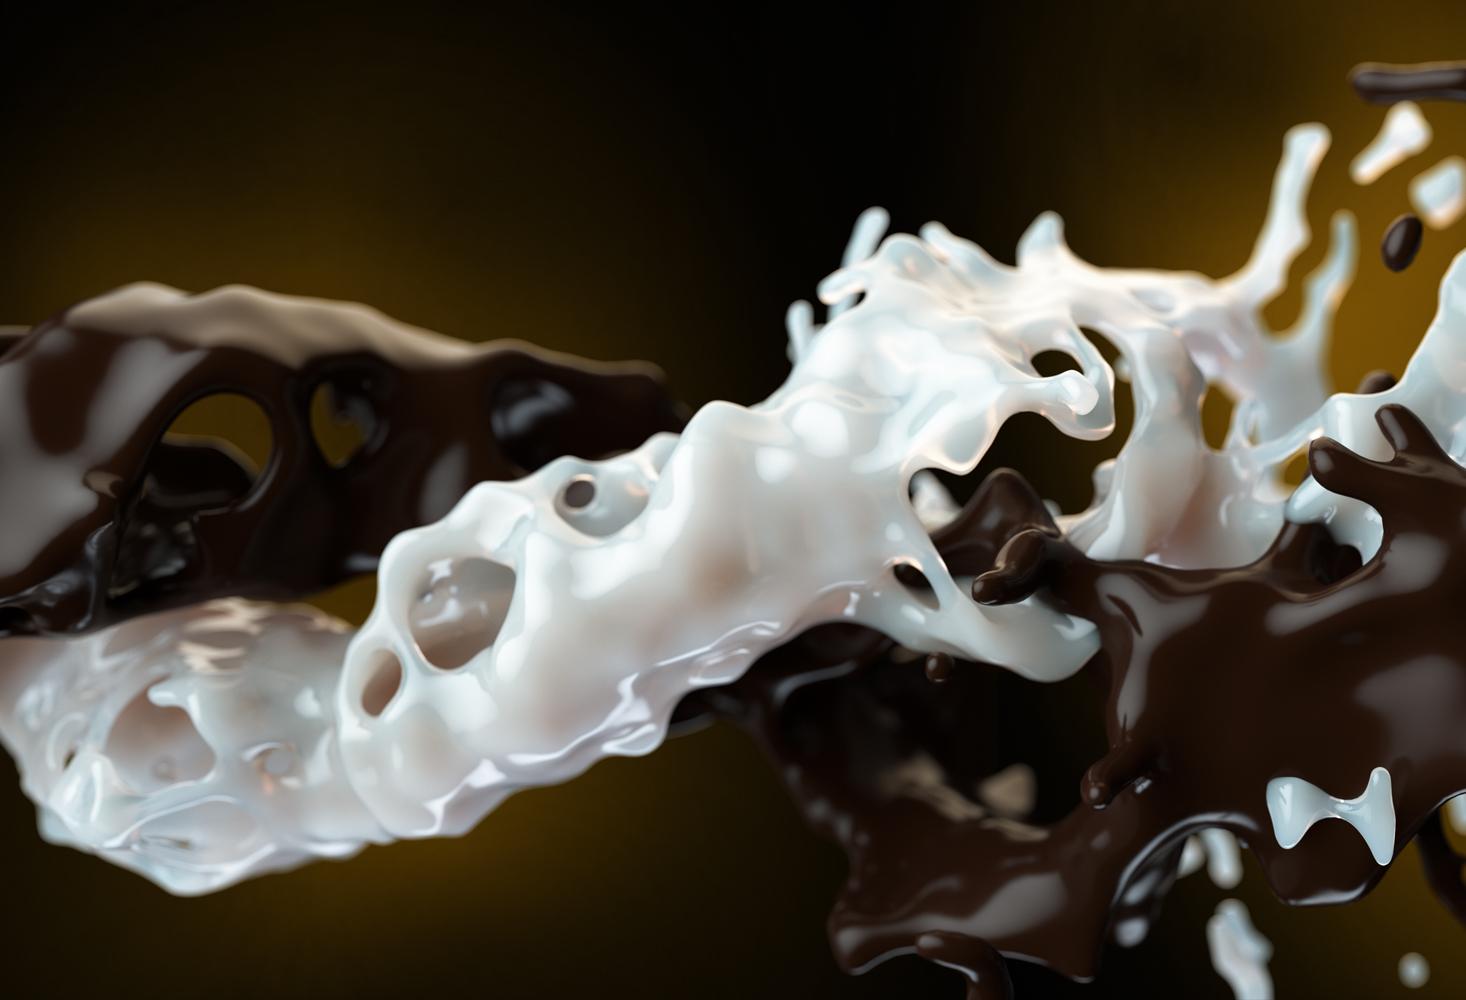 CGI Splash Fluids | Studio Capicua